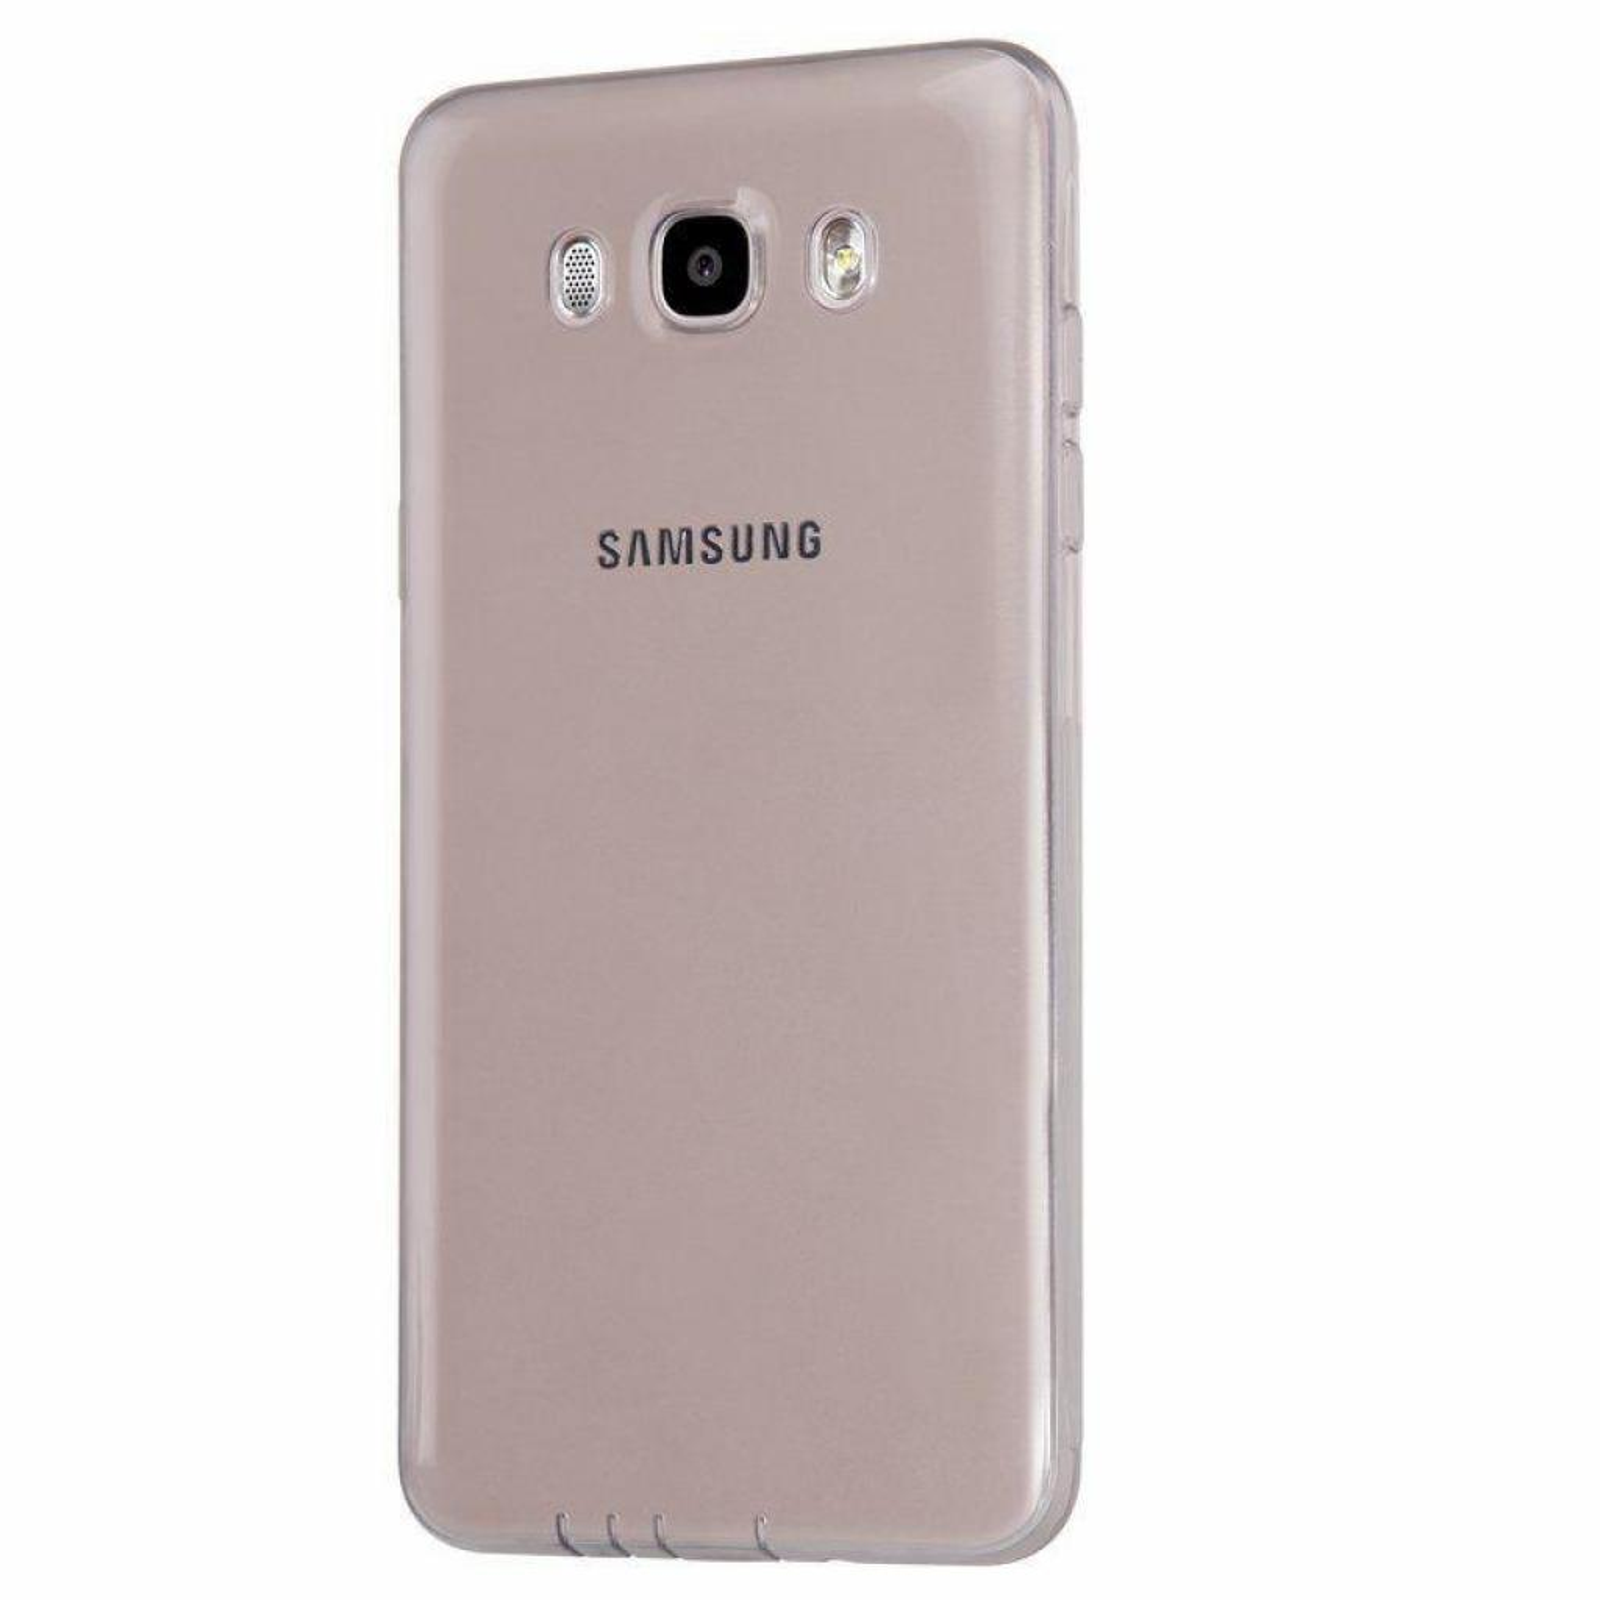 Чехол для моб. телефона SmartCase Samsung Galaxy J5 / J510 TPU Clear (SC-J510) изображение 2